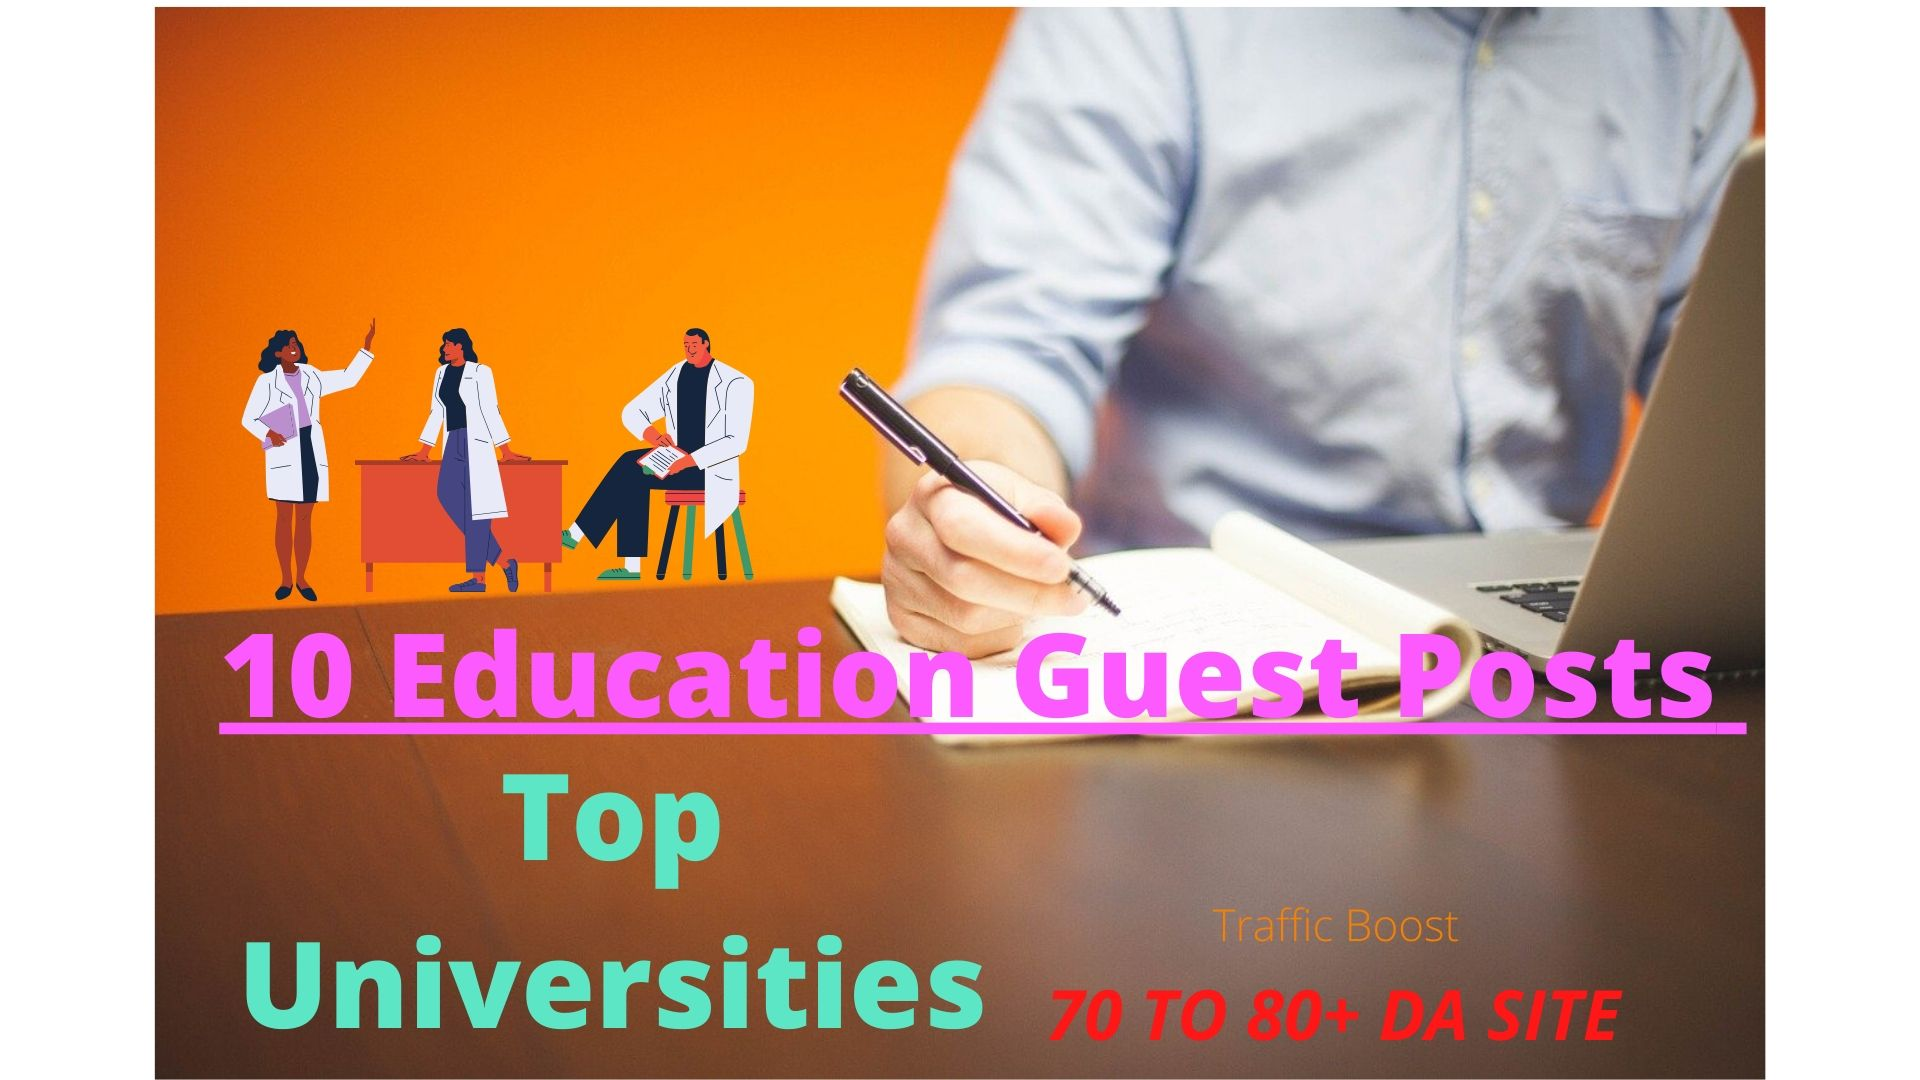 80 + DA Site 5 Education Guest Posts on Top Universities